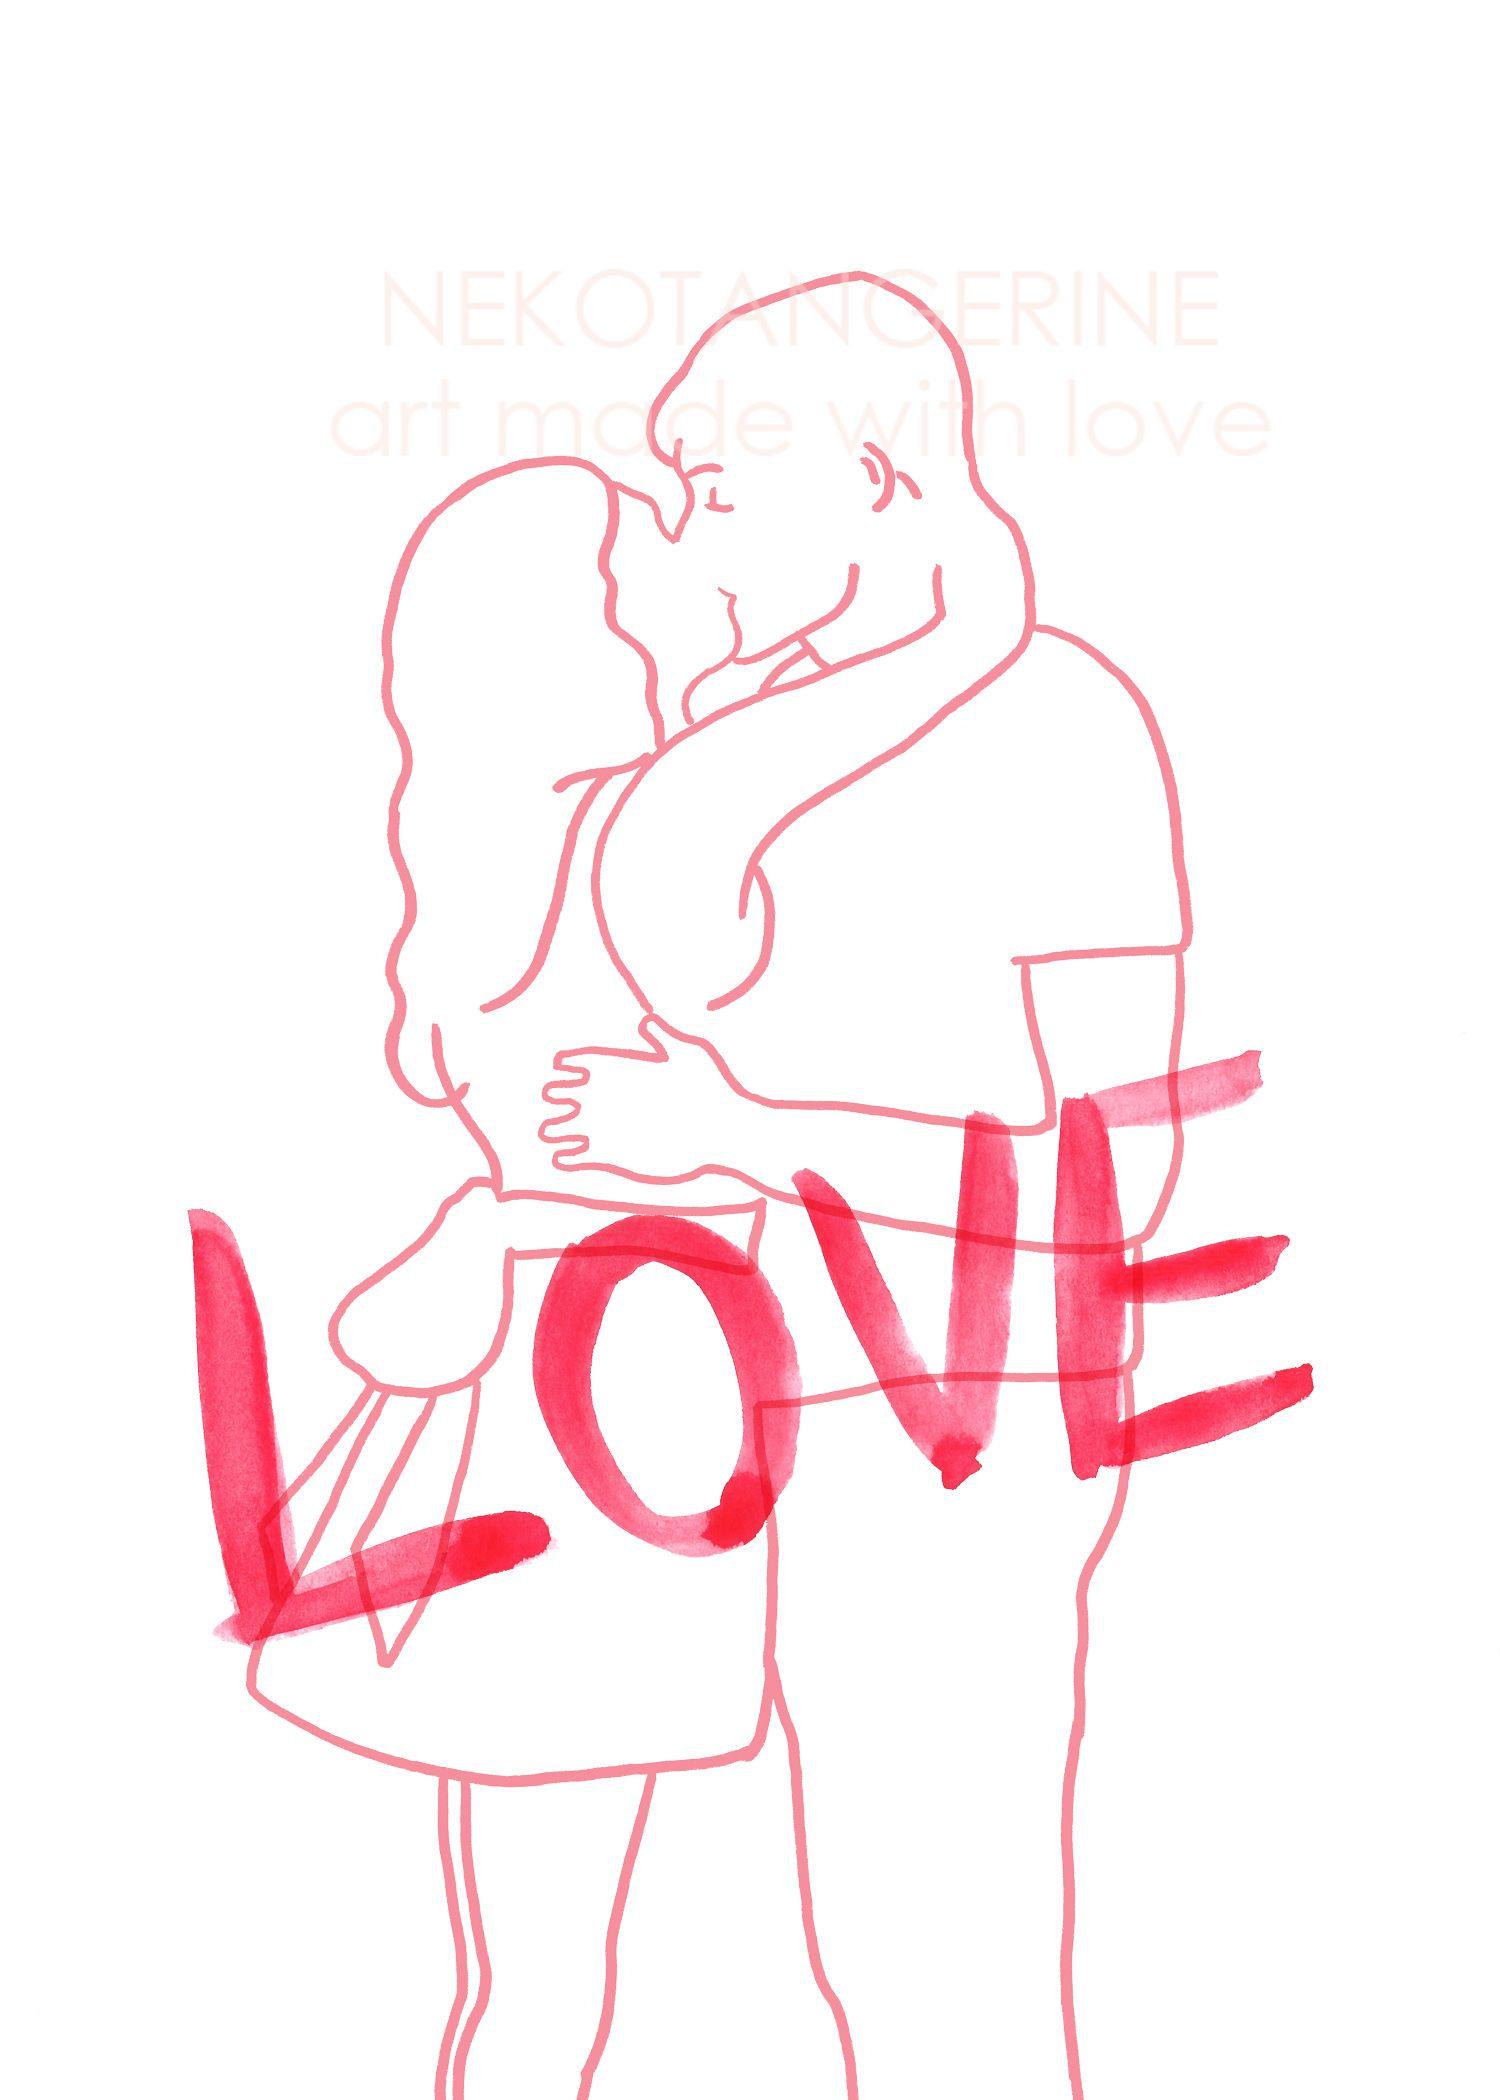 Embrace Valentines Day Decor Printable Line Art Posters Art Prints Line Artwork